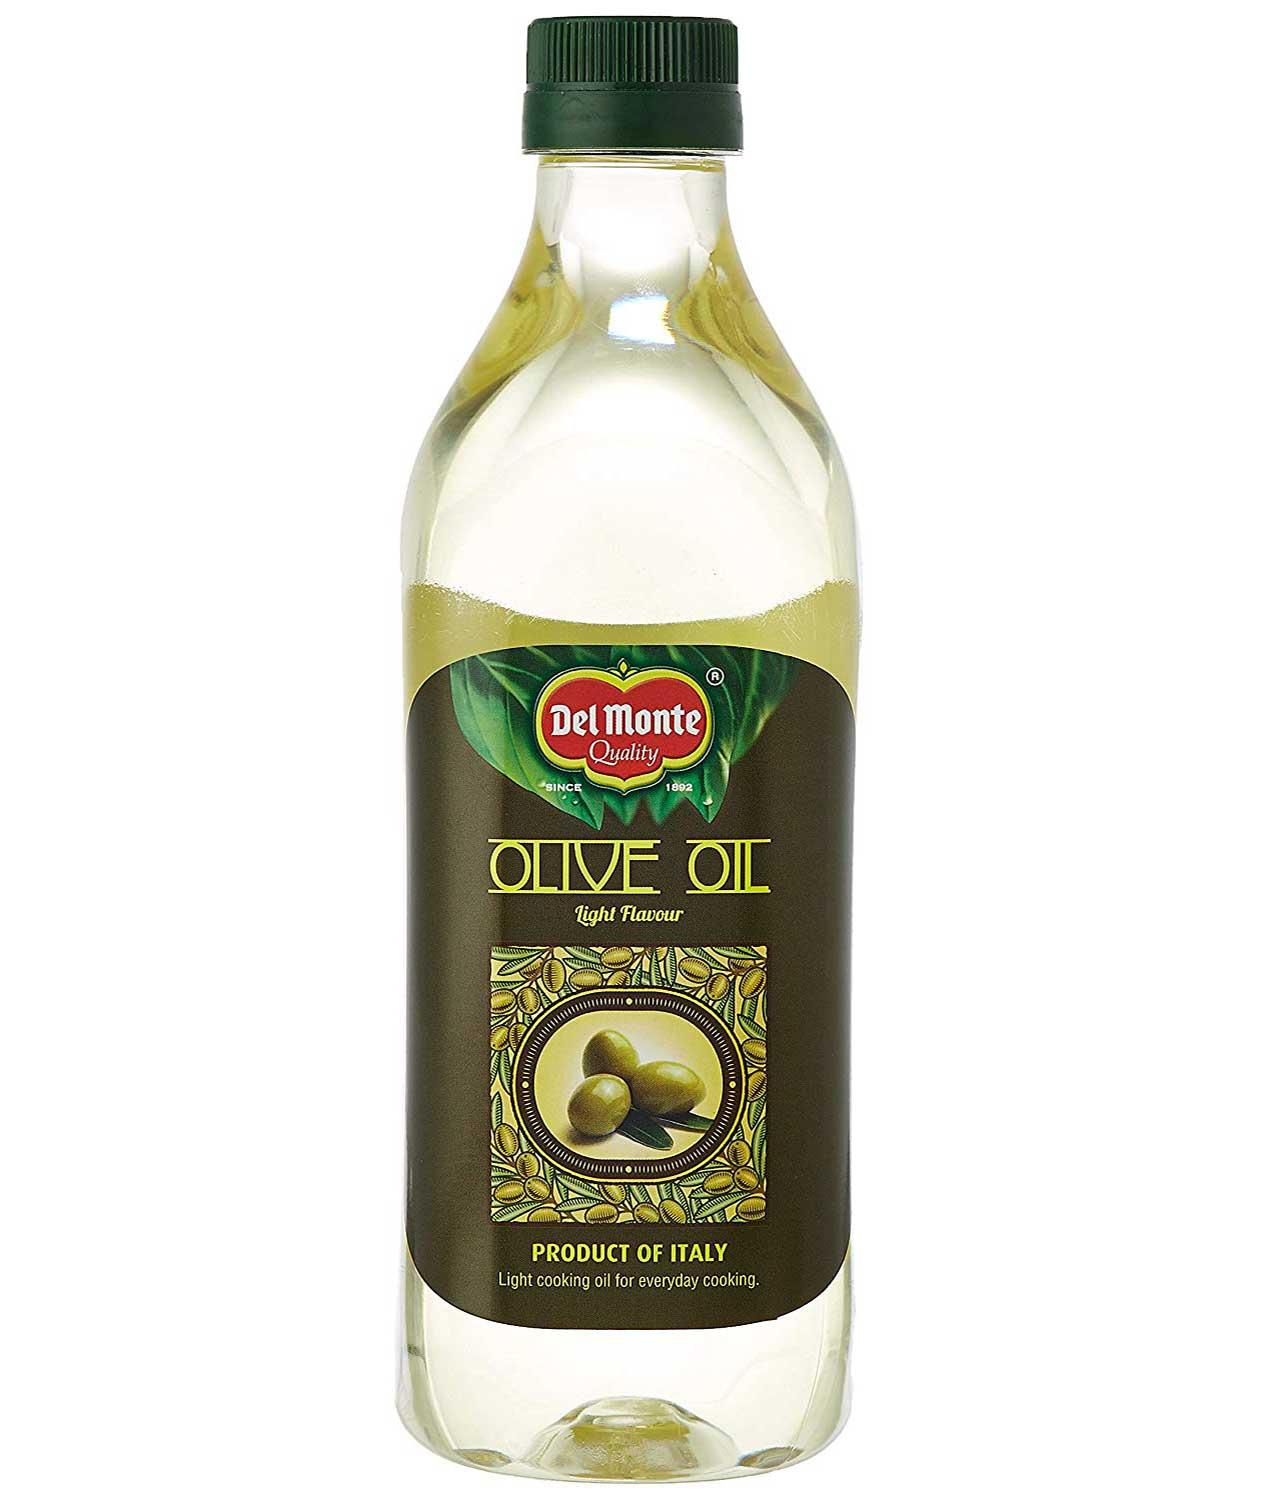 Del Monte Light Olive Oil Pet Bottle, 1L